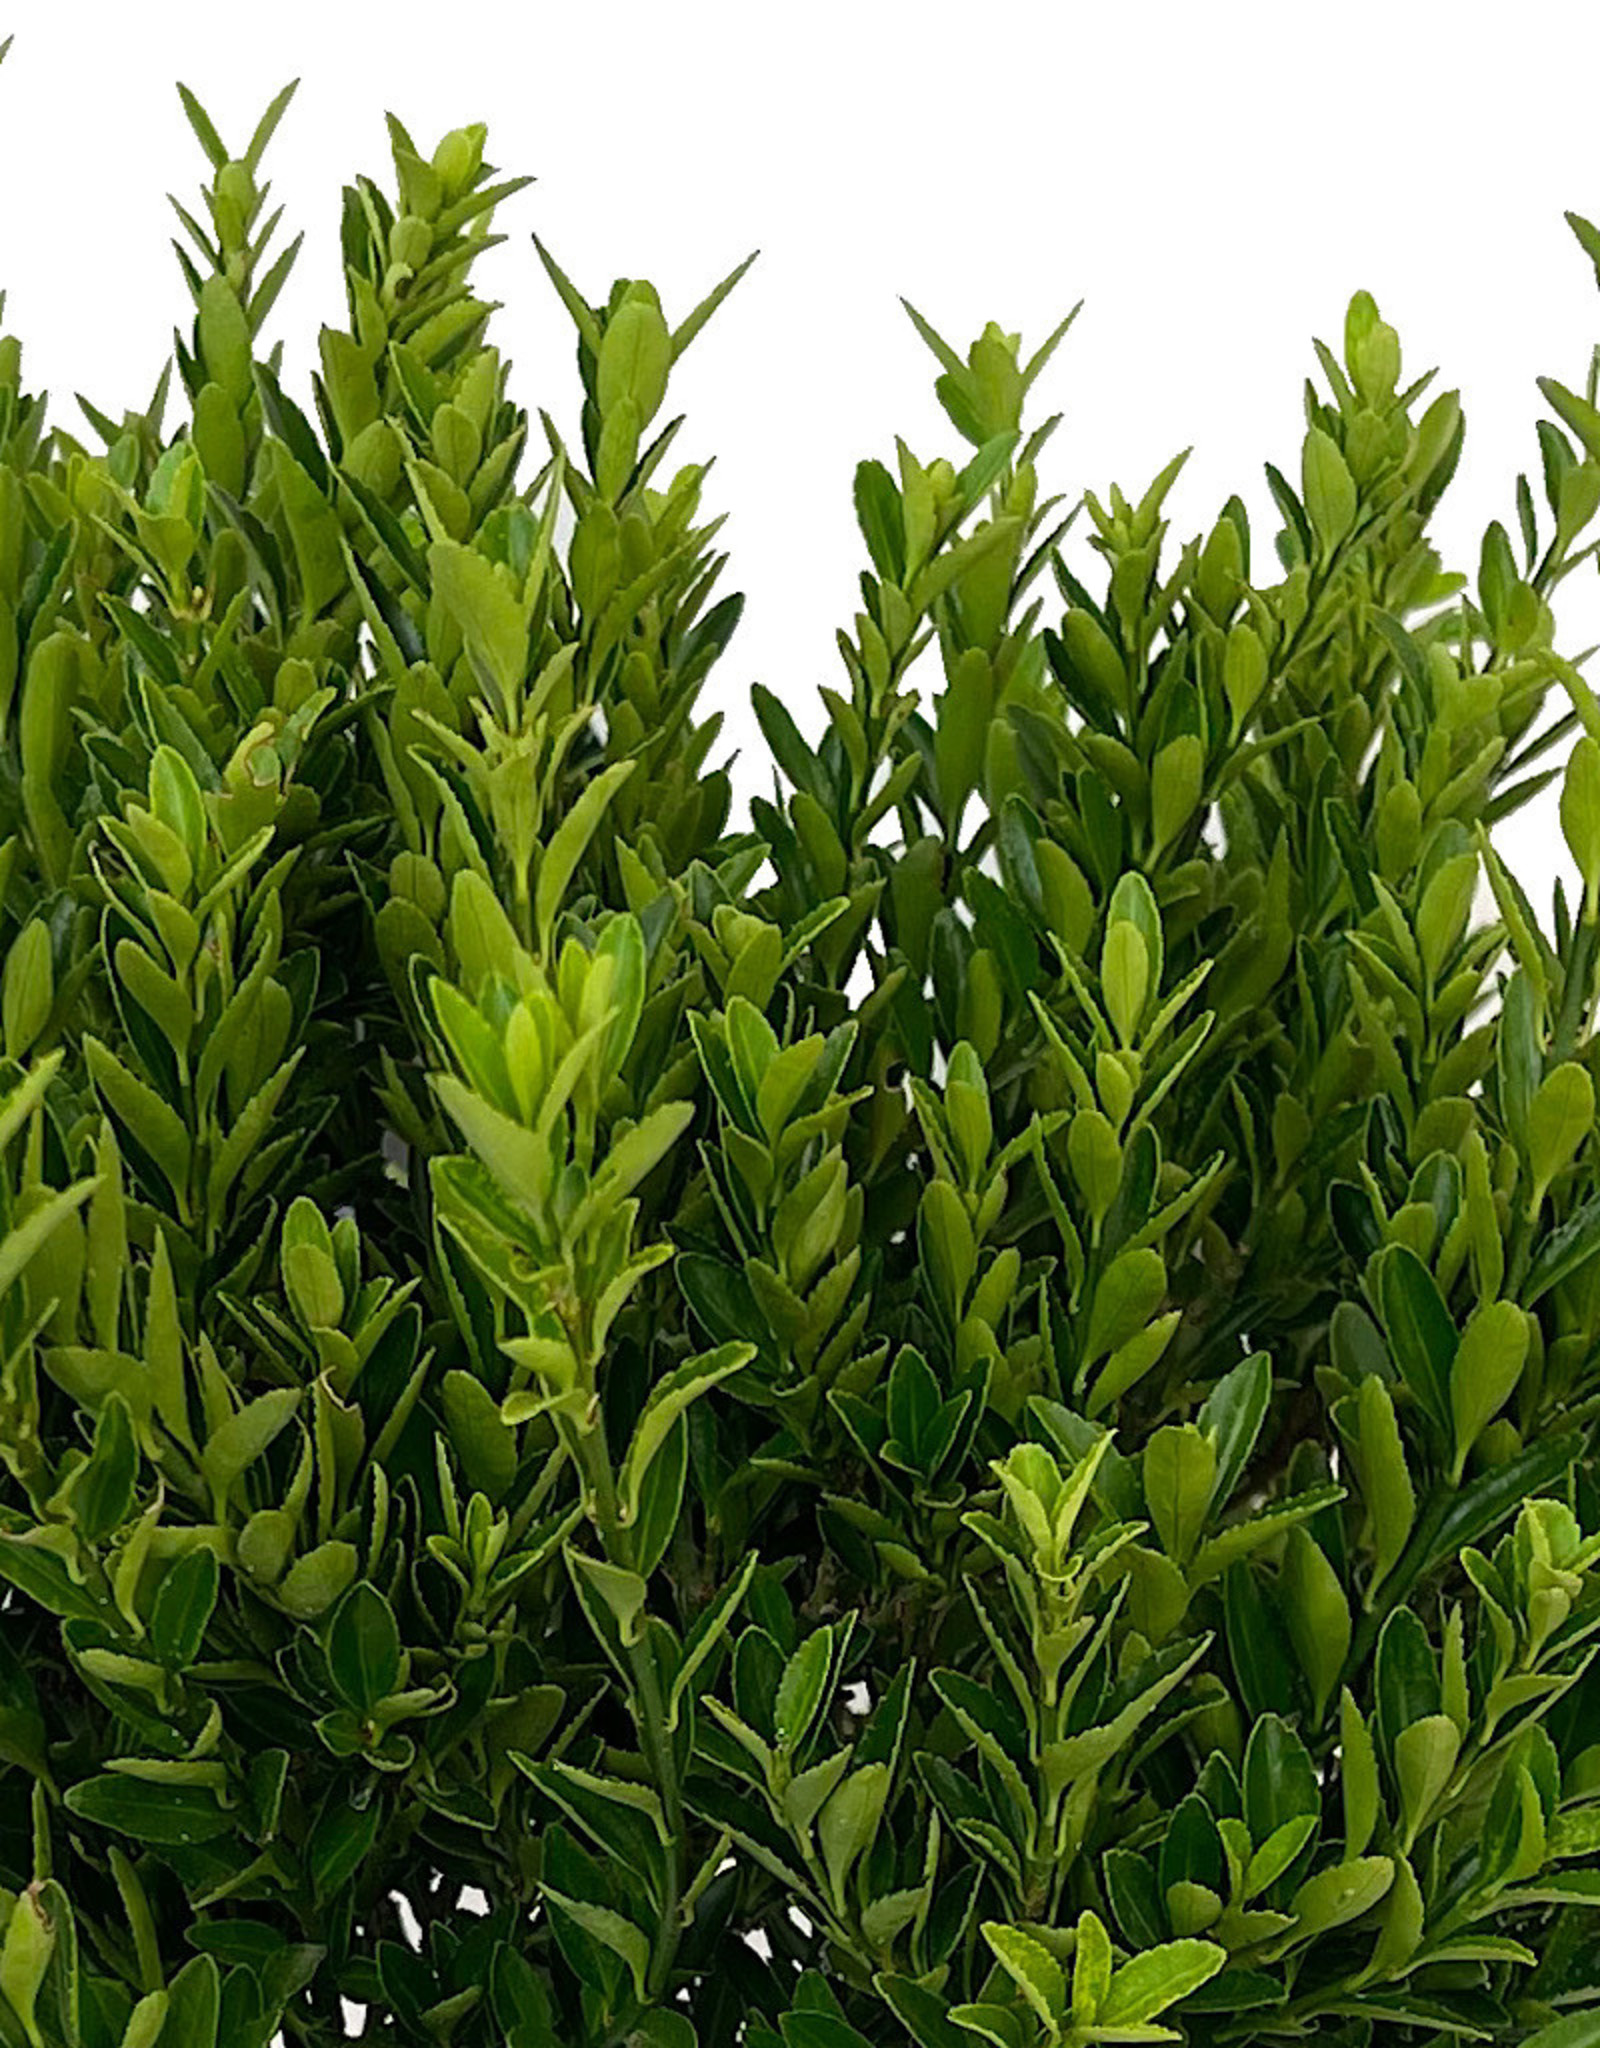 Euonymus j. 'Microphylla' 1 Gallon